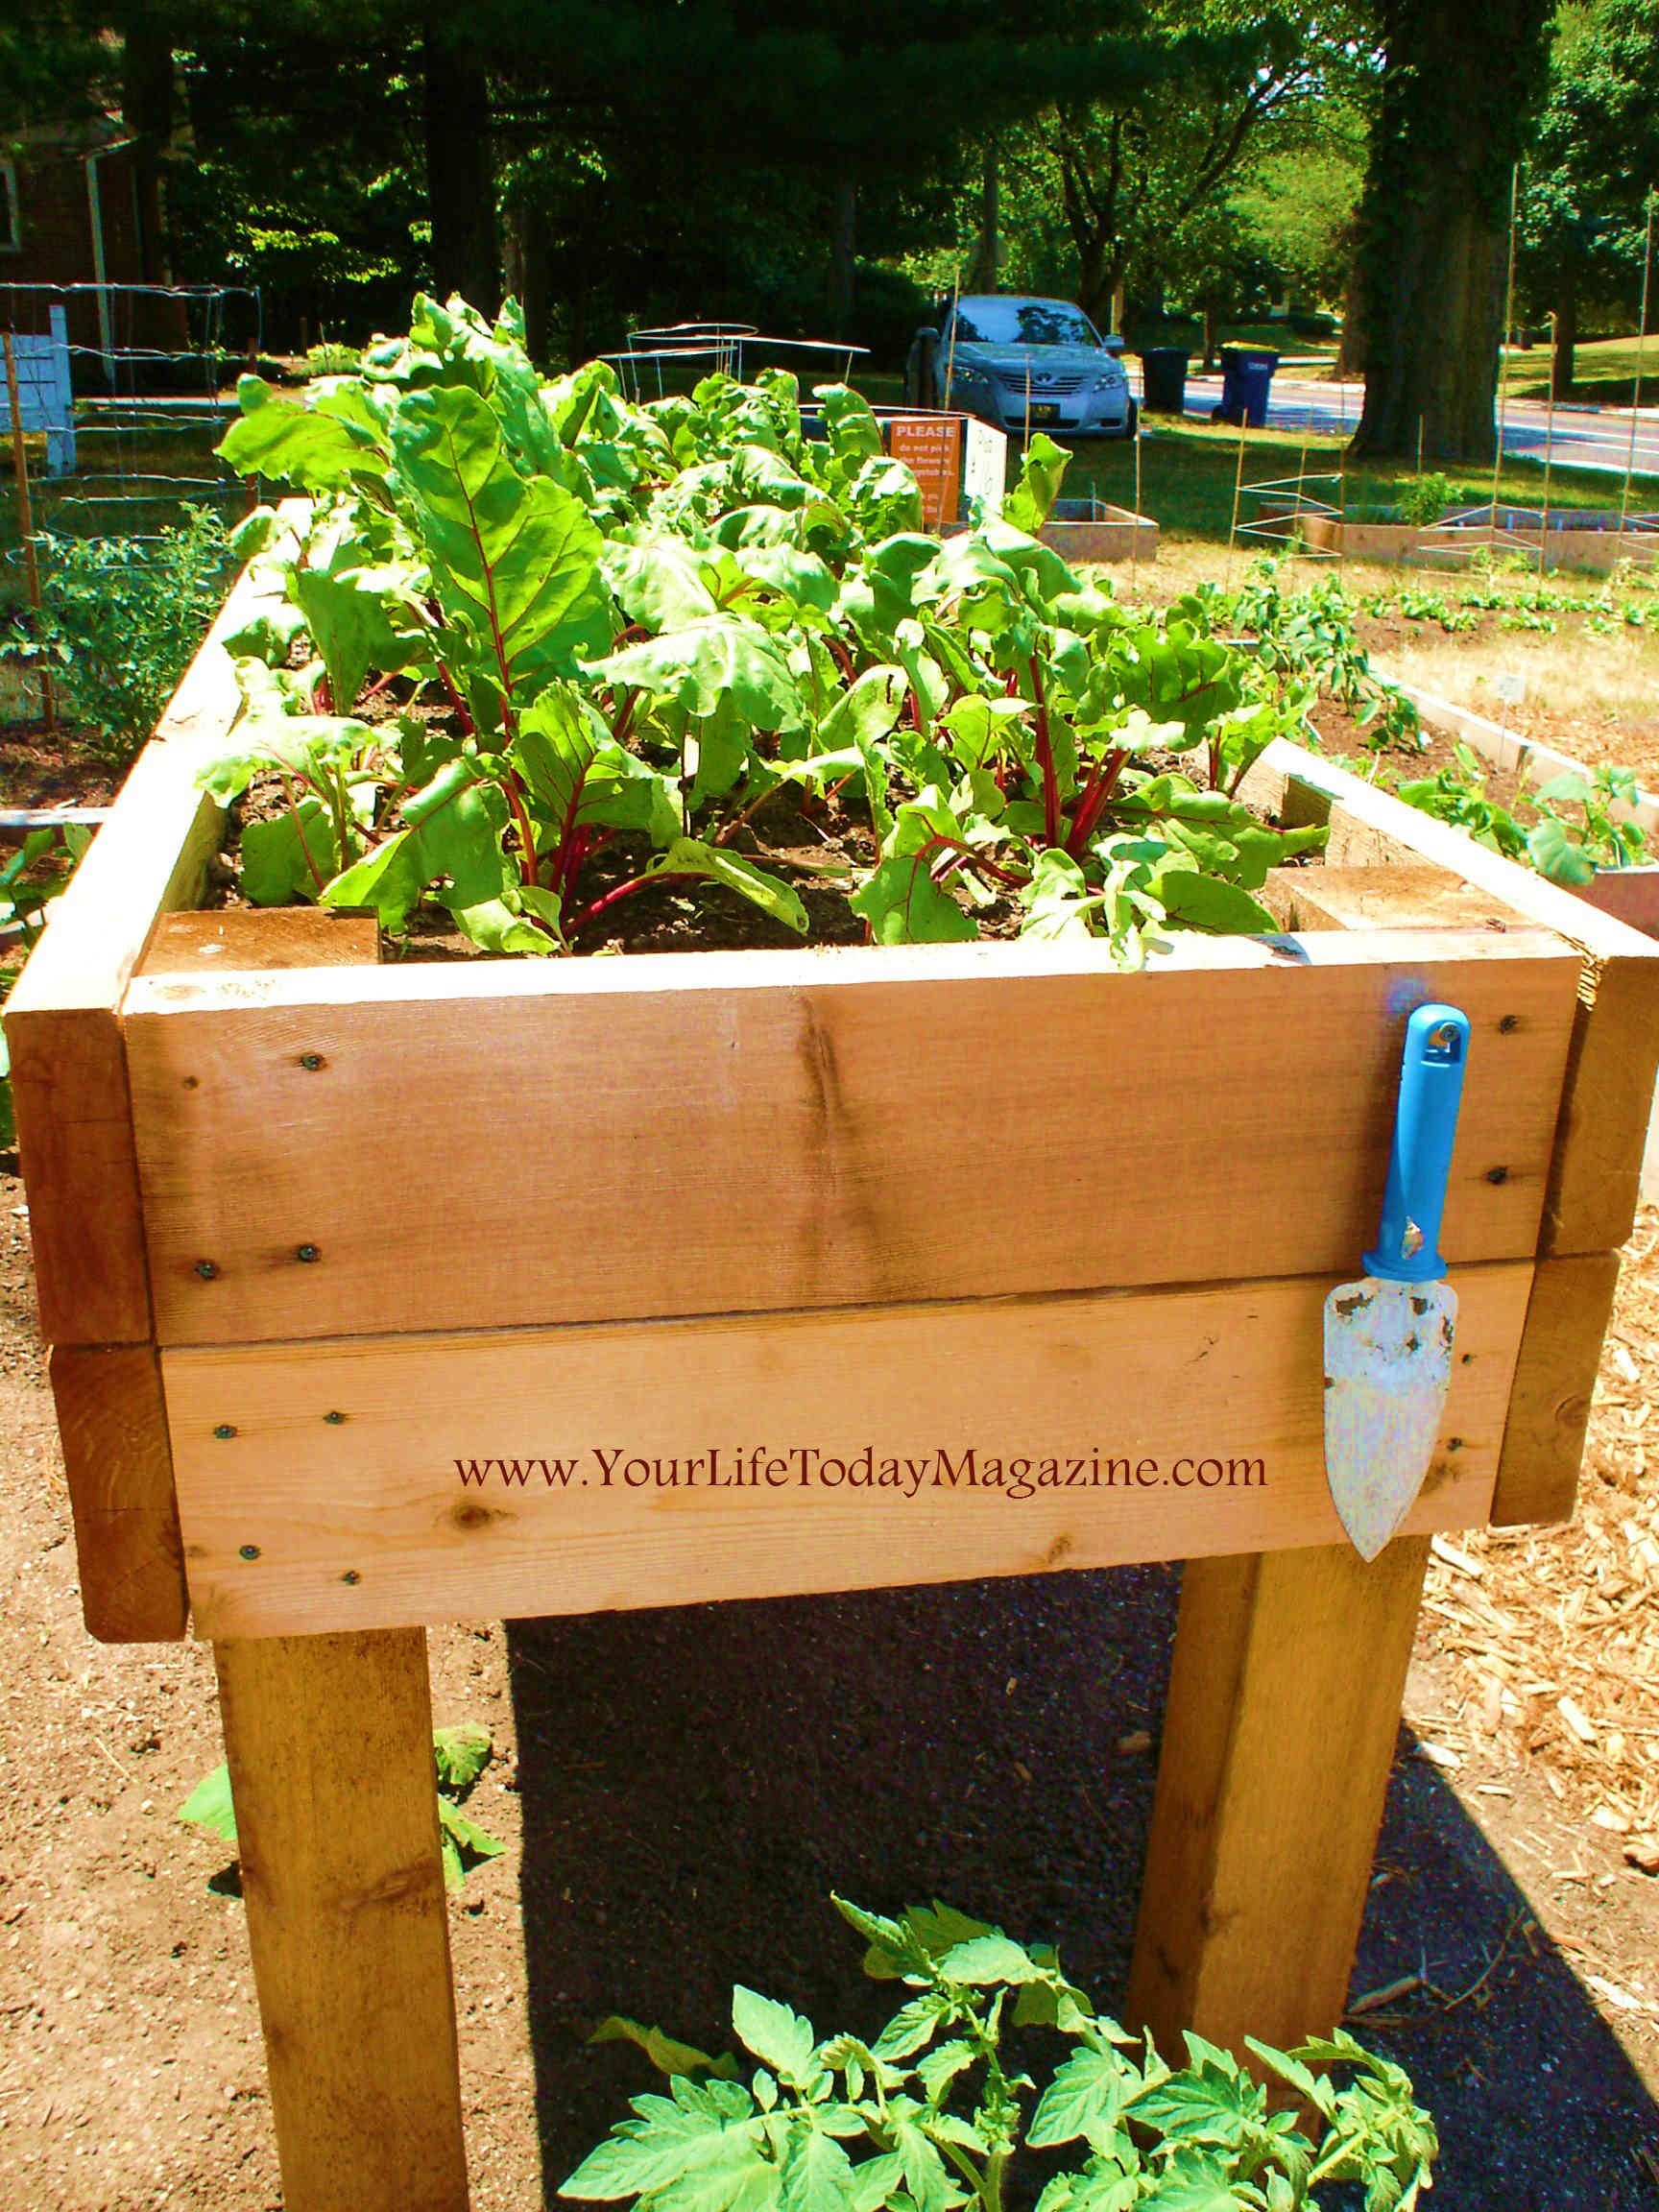 If You Love Garden Fresh Vegetables But Dread Tilling The Hard